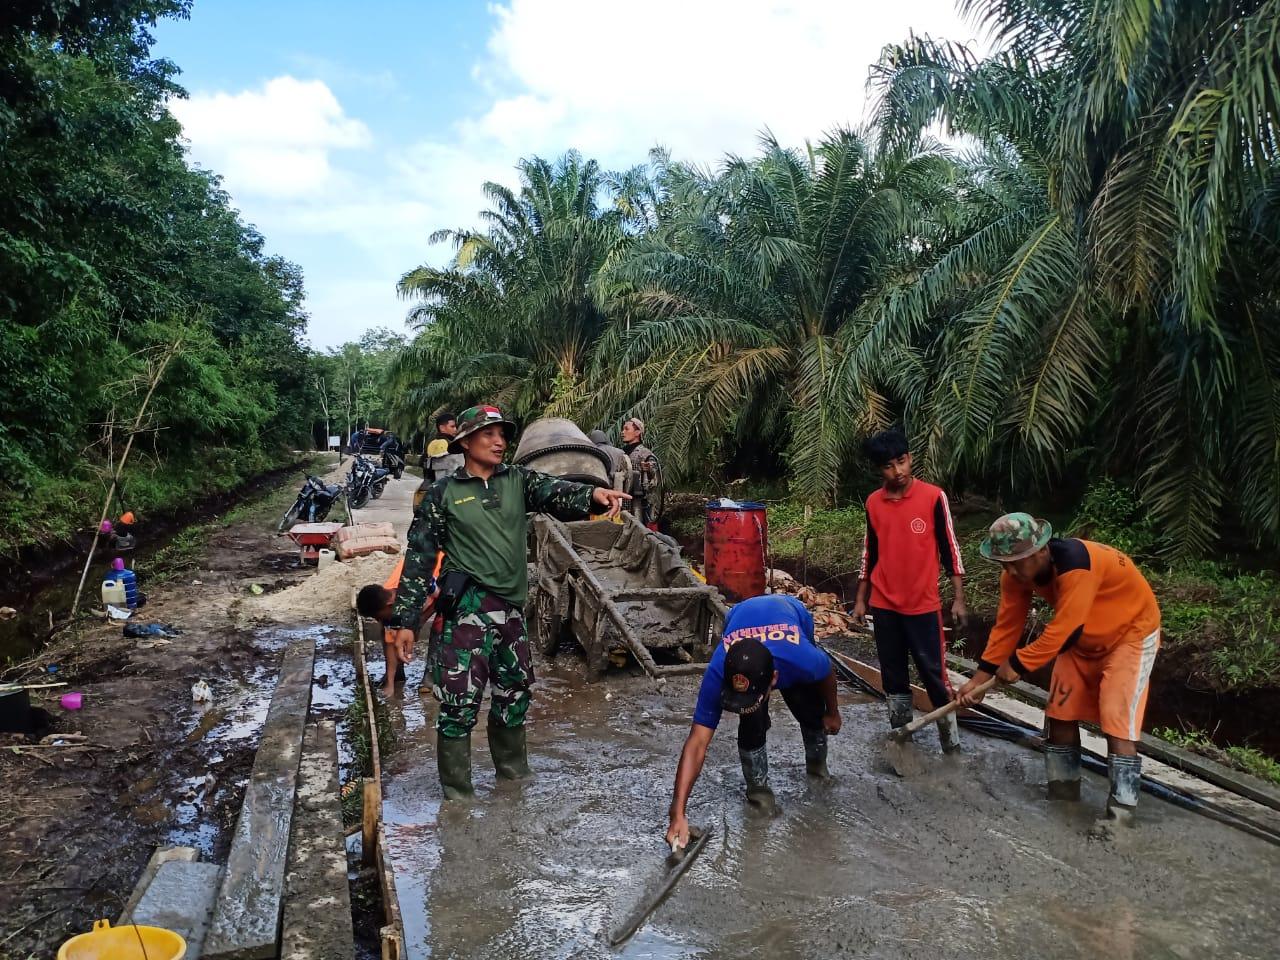 Bahar Warga Desa Temiang : Kerja Bakti Kami Rela Bergabung Dengan TNl